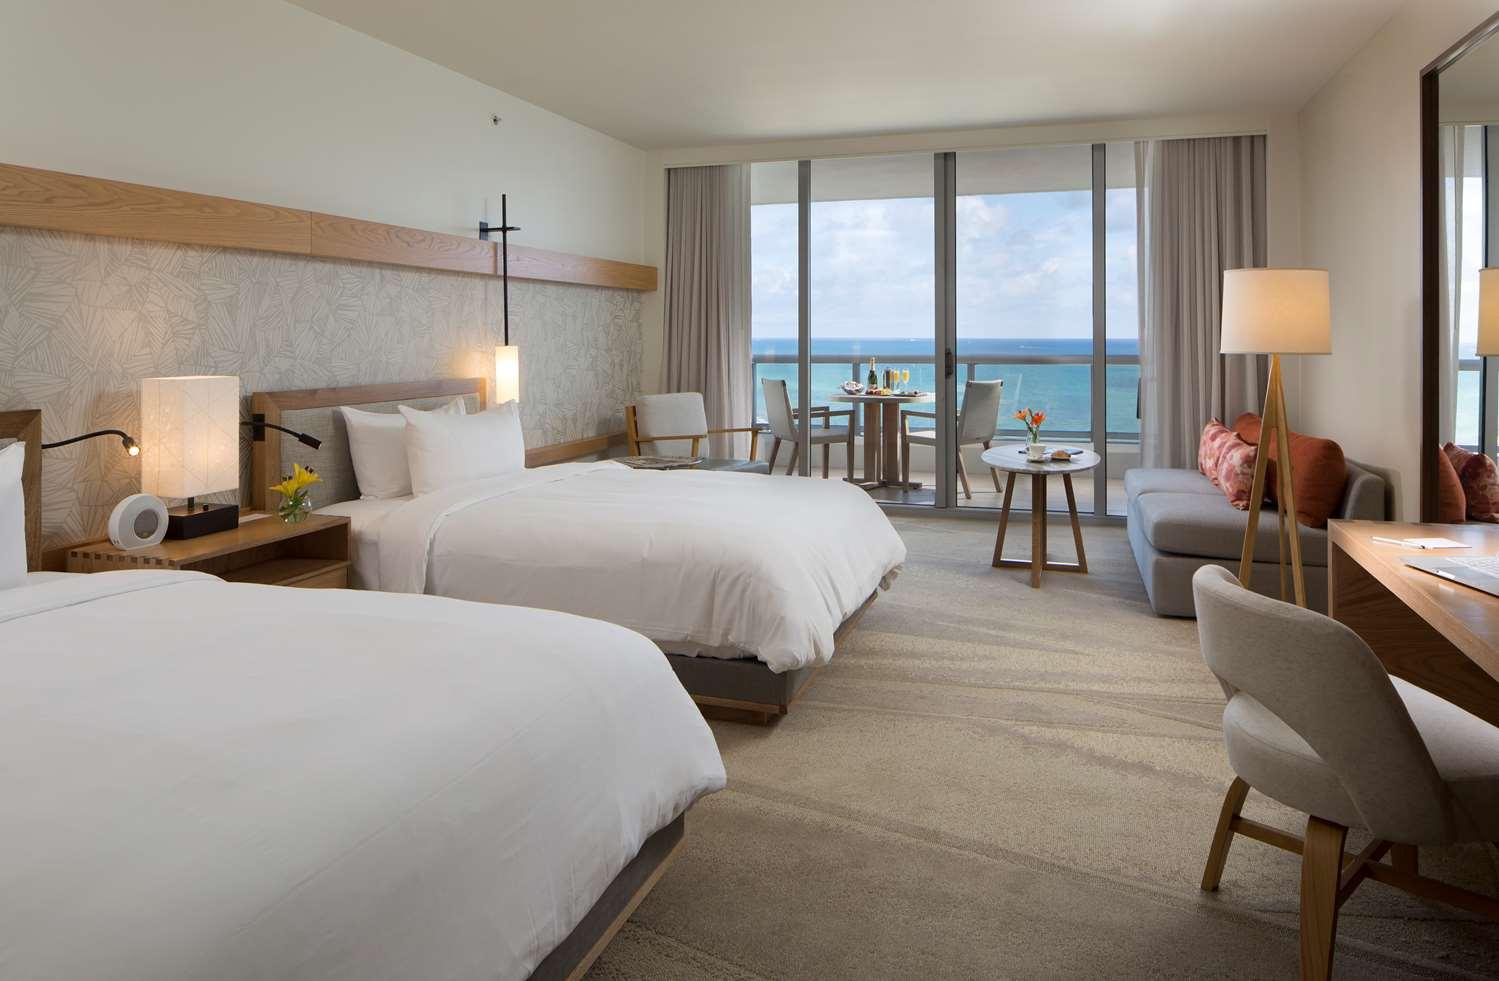 eden roc hotel north miami beach, fl - see discounts